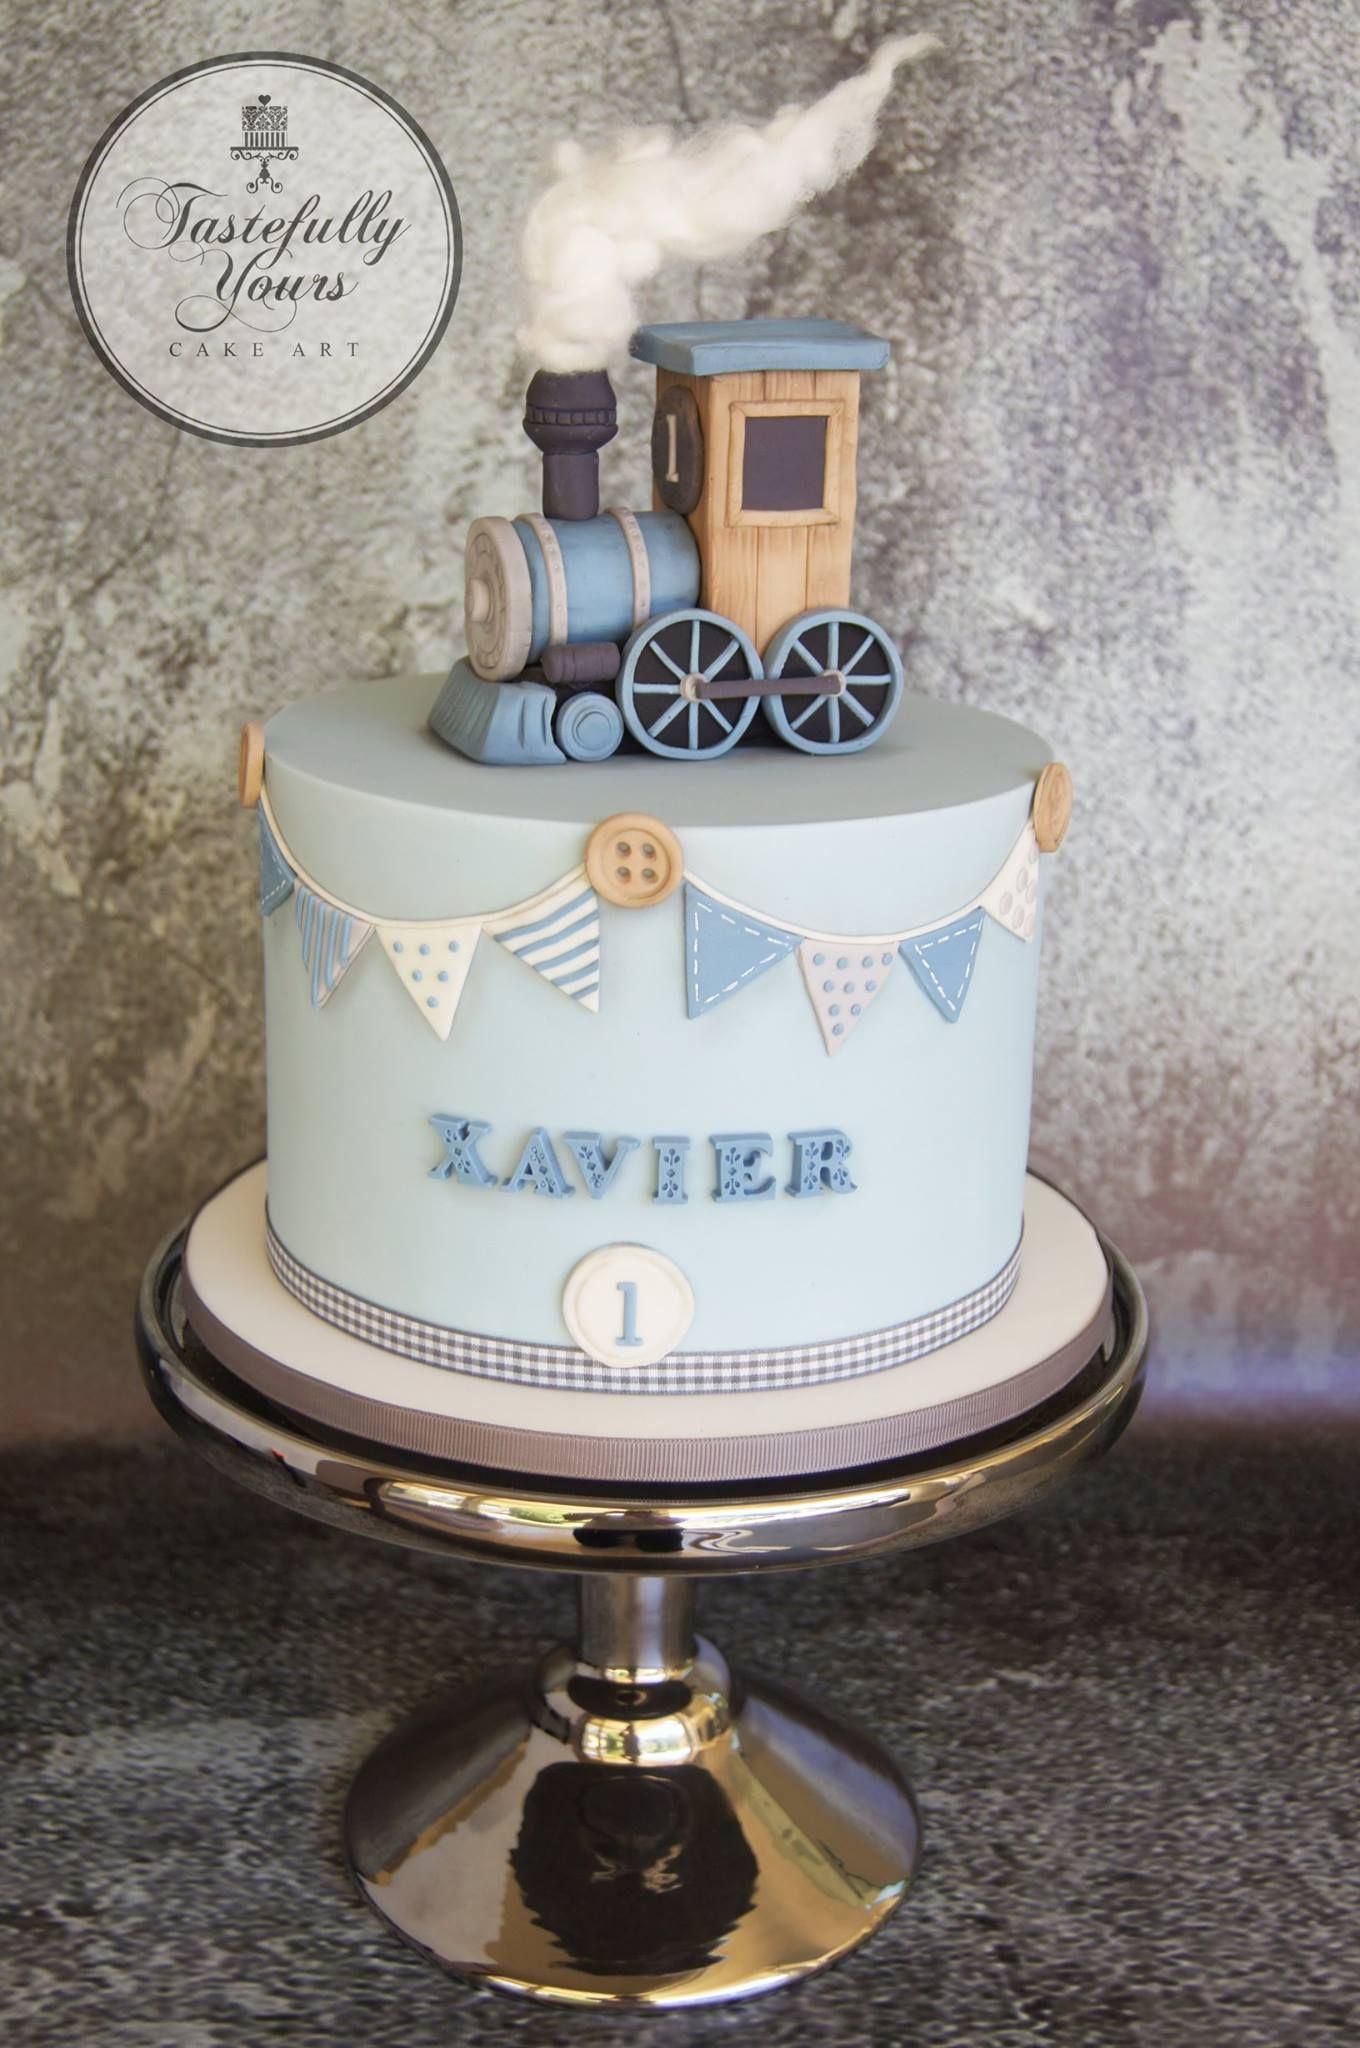 Tastefully Yours Cake Art I need this Pinterest Cake